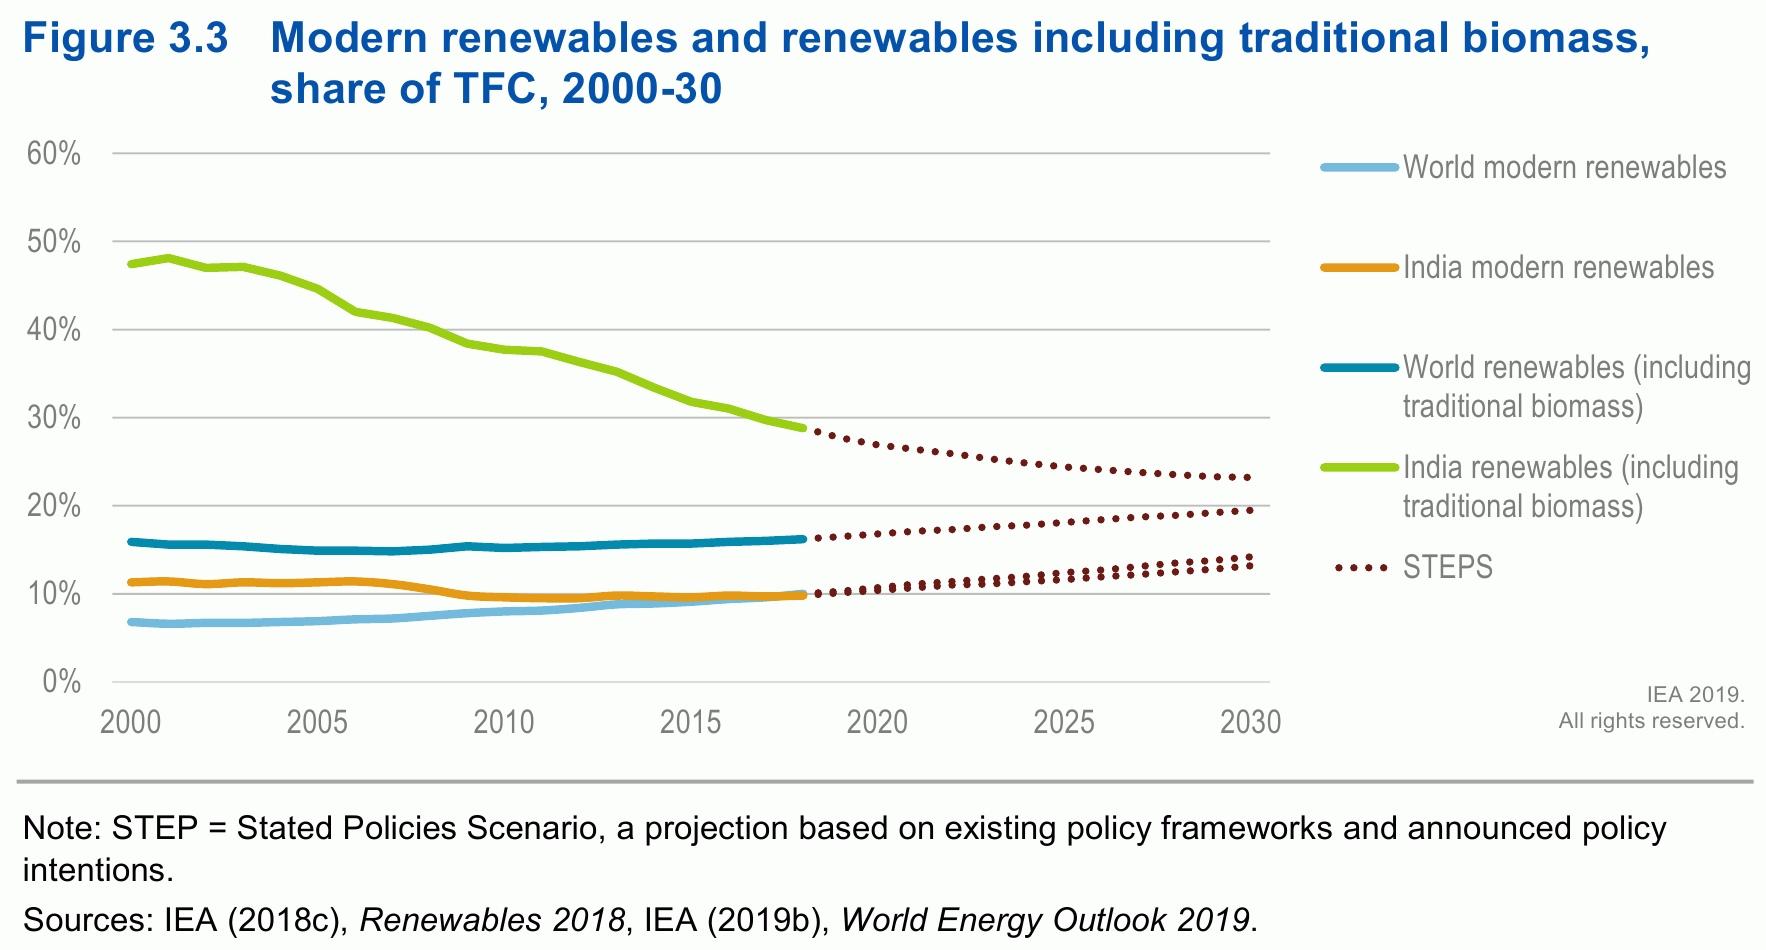 IEA.org: Энергетика Индии 2020 и перспективы до 2020 года